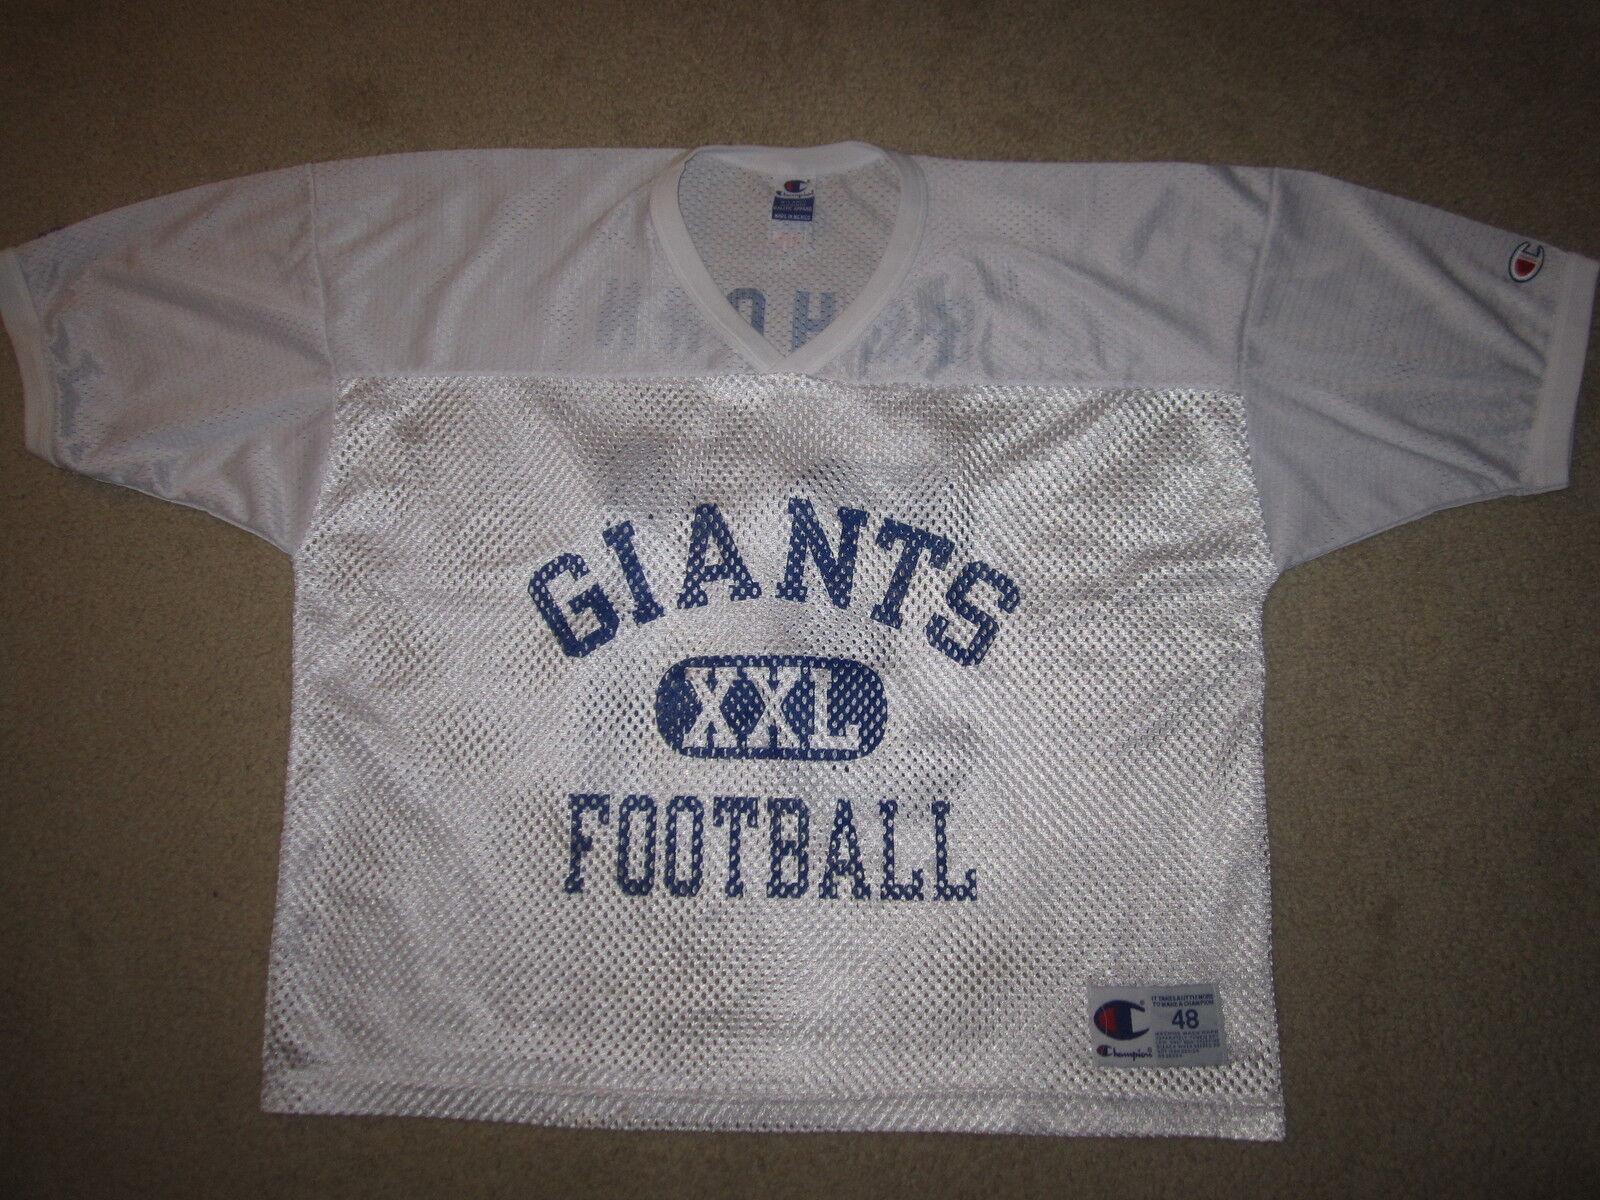 Jason Sehorn  31 New York Giants Champion NFL Trikot 48 XL  | Neue Produkte im Jahr 2019